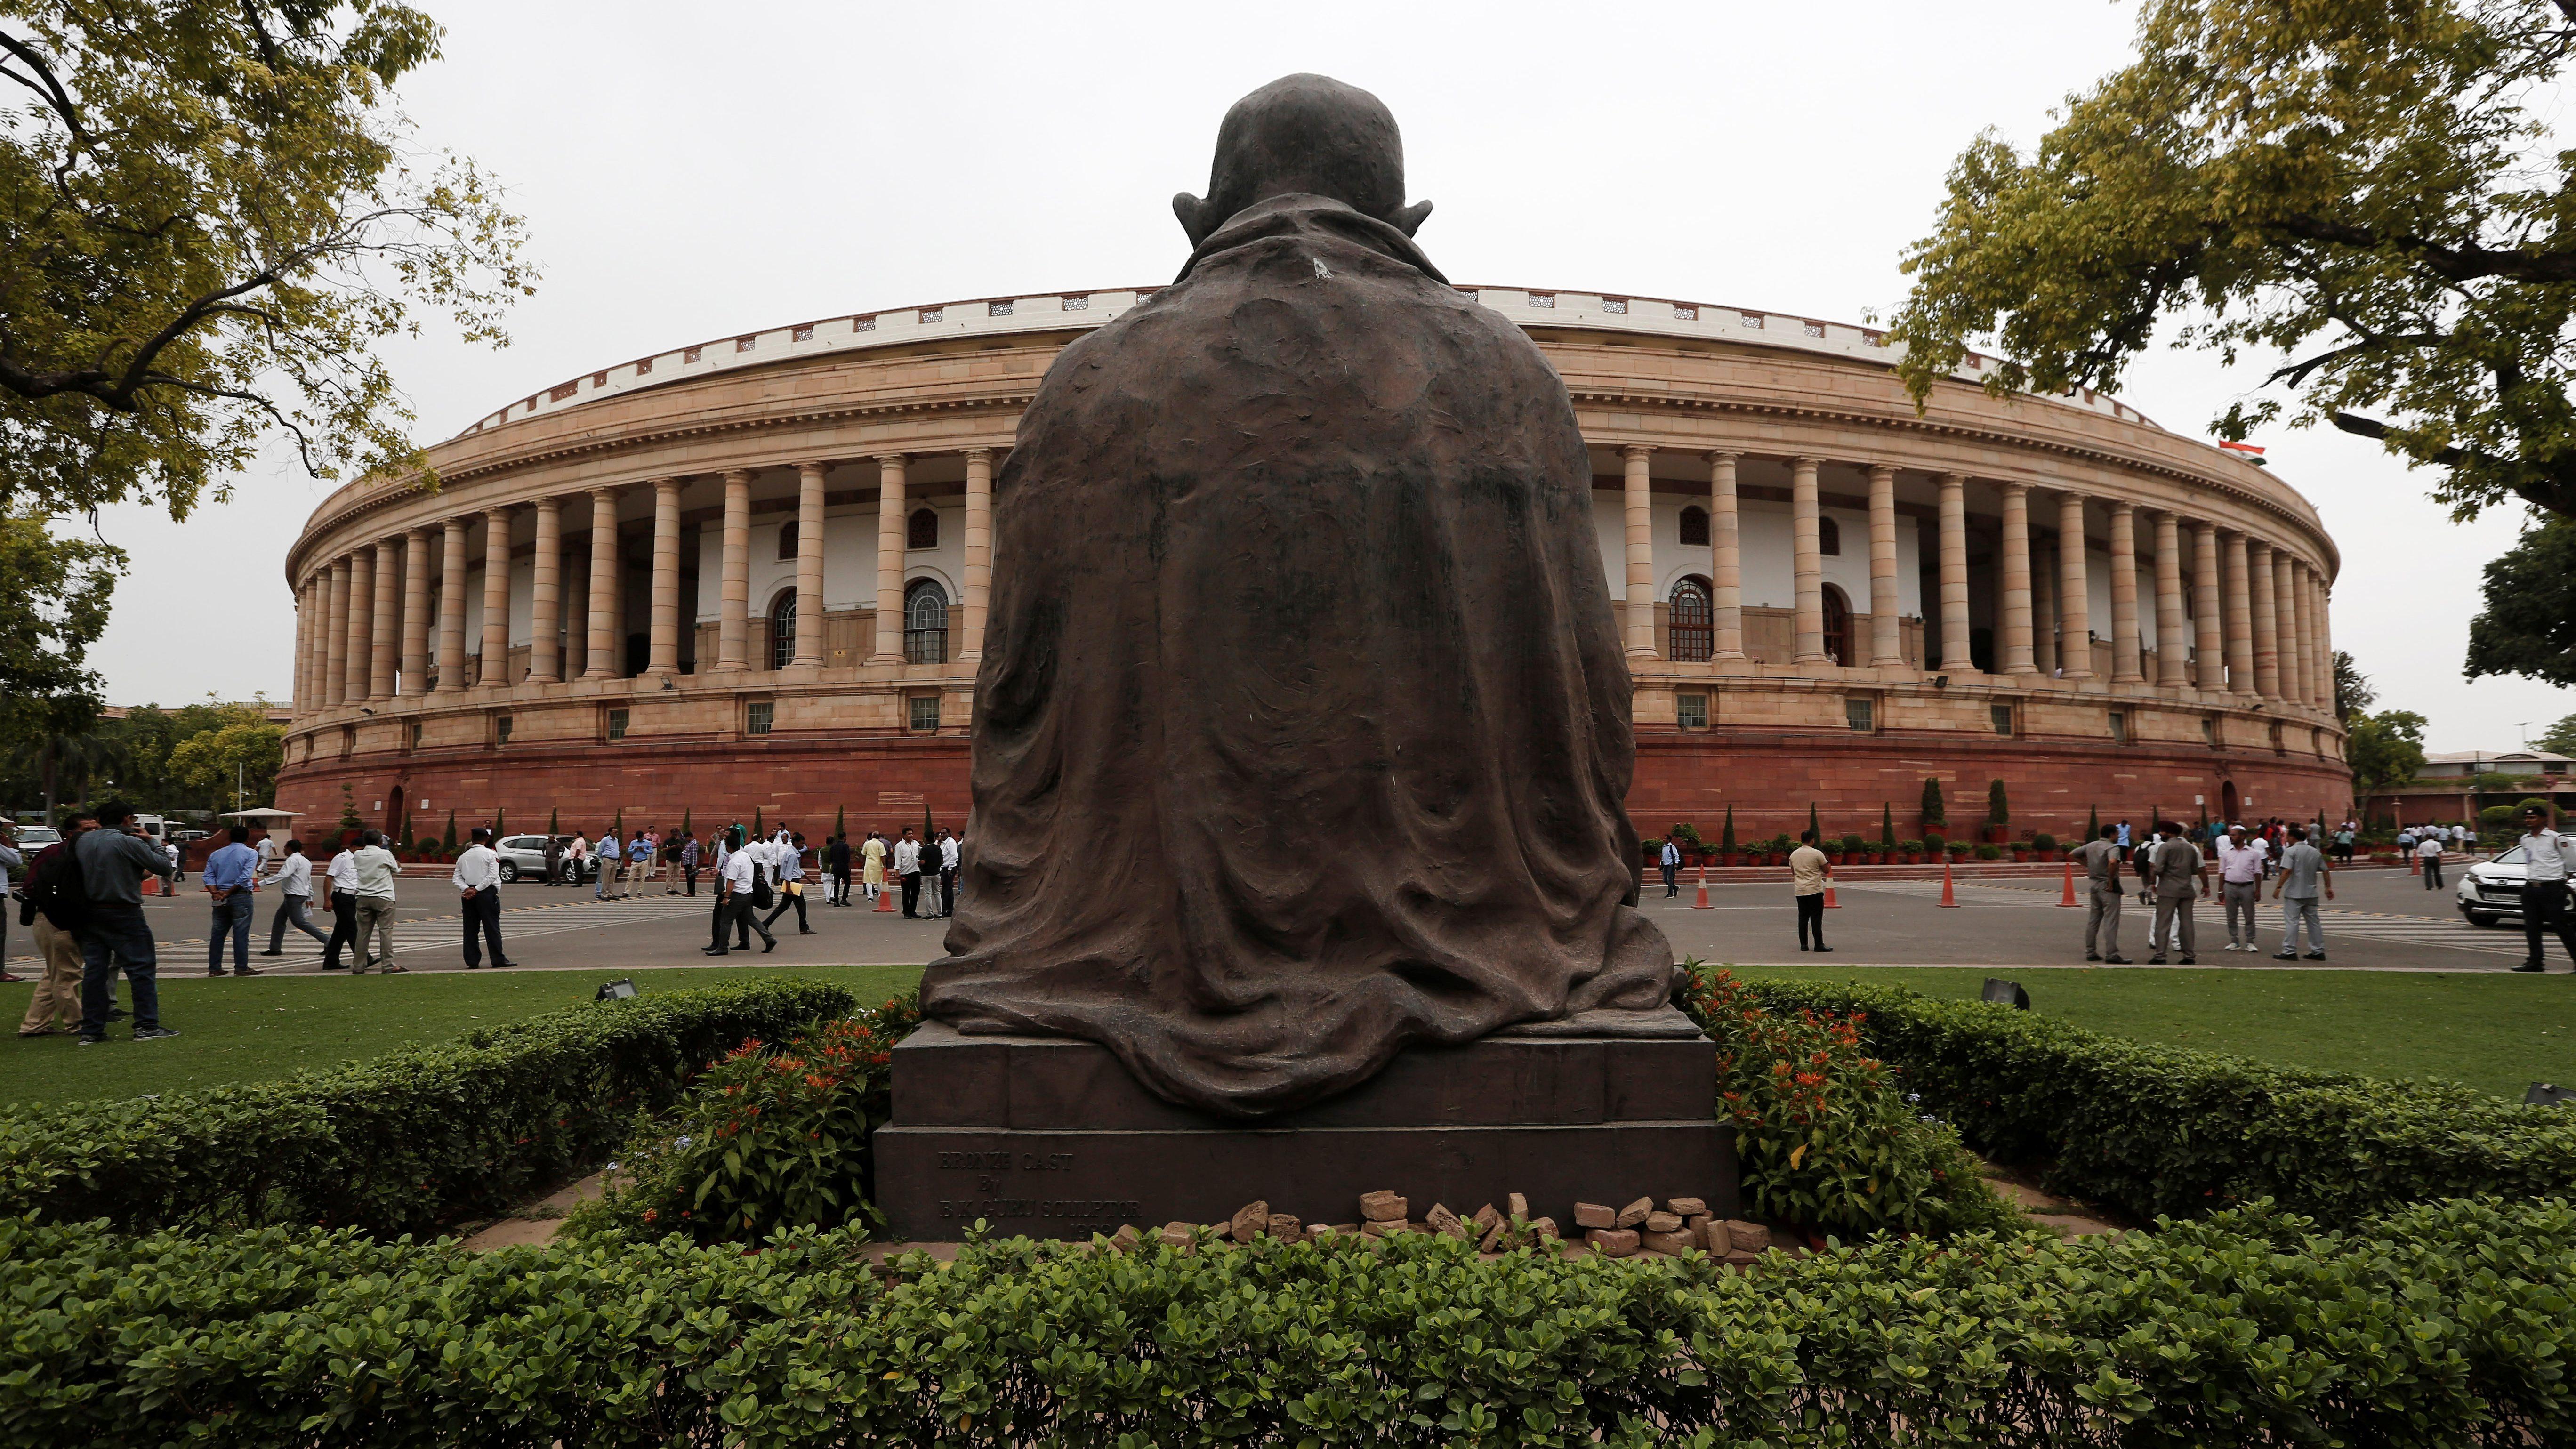 Modi wants to revamp Delhi but so did the Pandavas, Tughluq